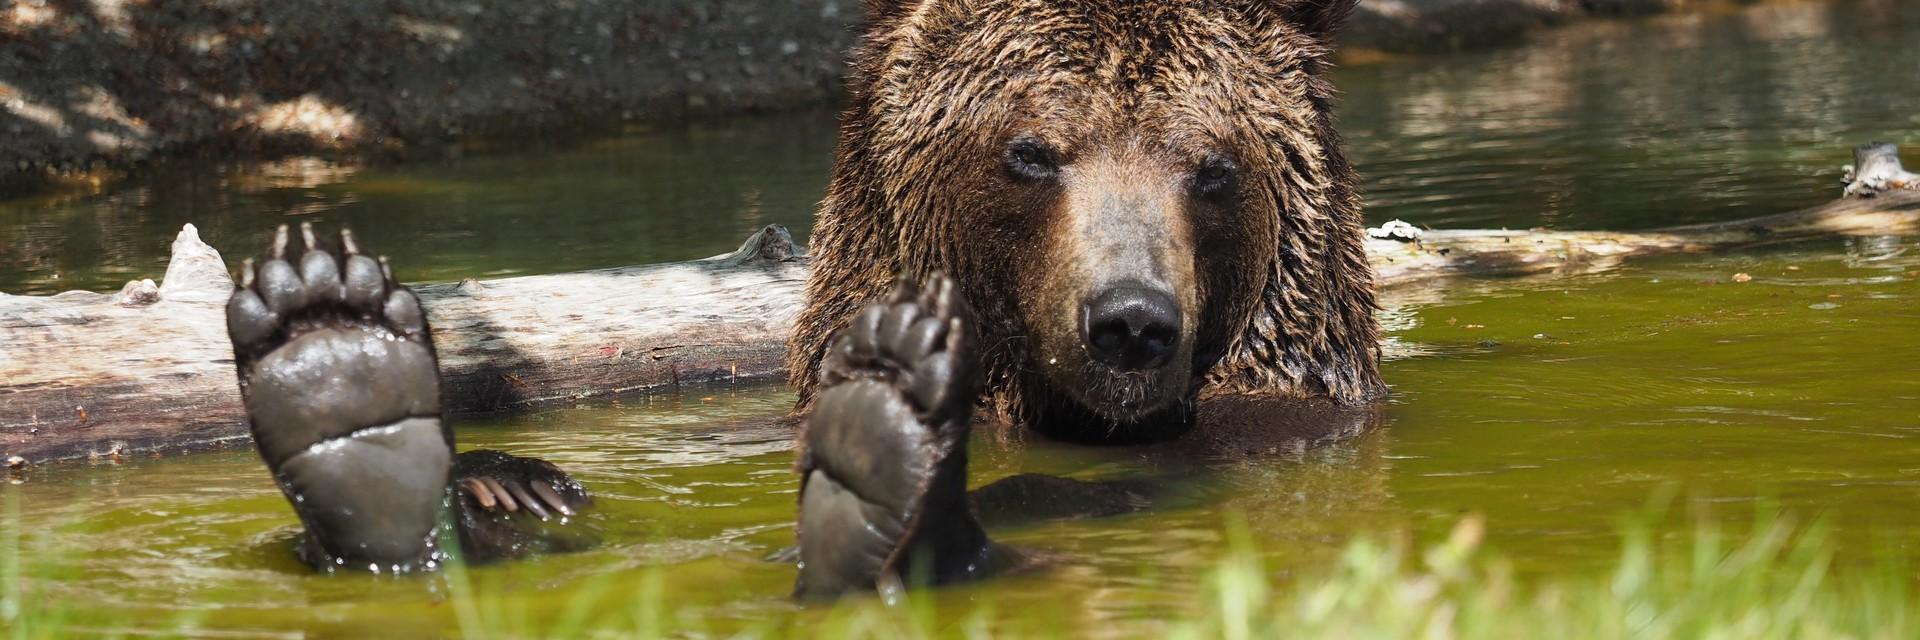 Bear Erich at BEAR SANCTUARY BEAR SANCTUARY Arbesbach